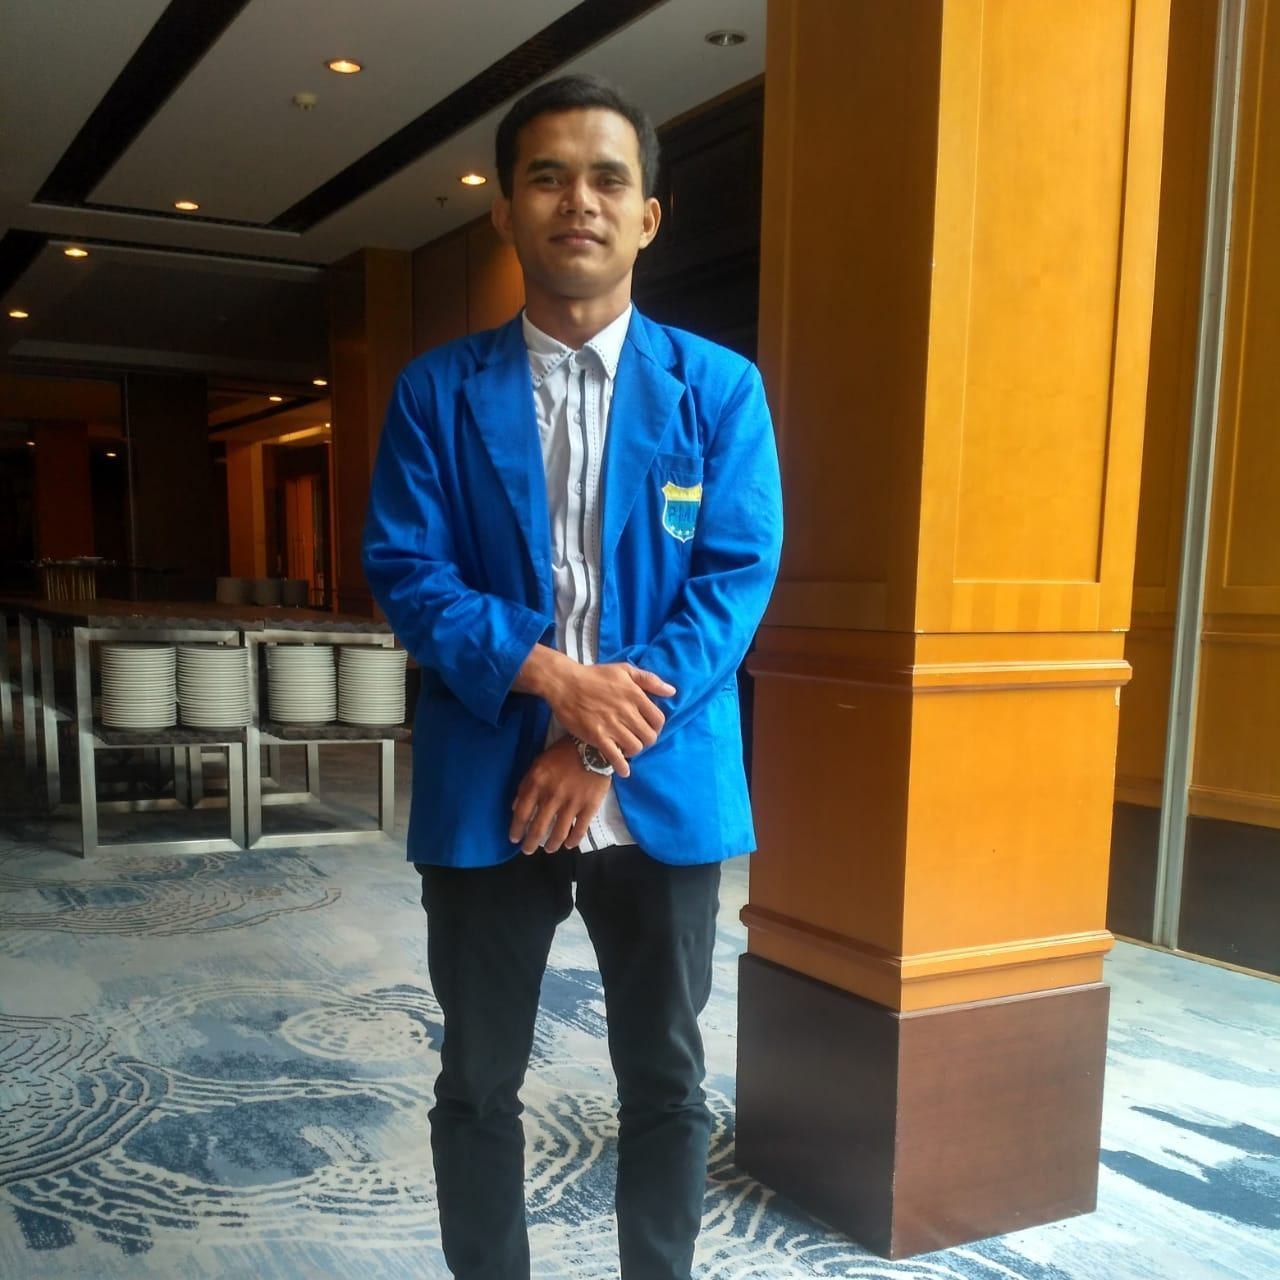 Jelang Pelantikan Presiden, Aktivis PMII Medan Ajak Masyarakat Sambut Gembira